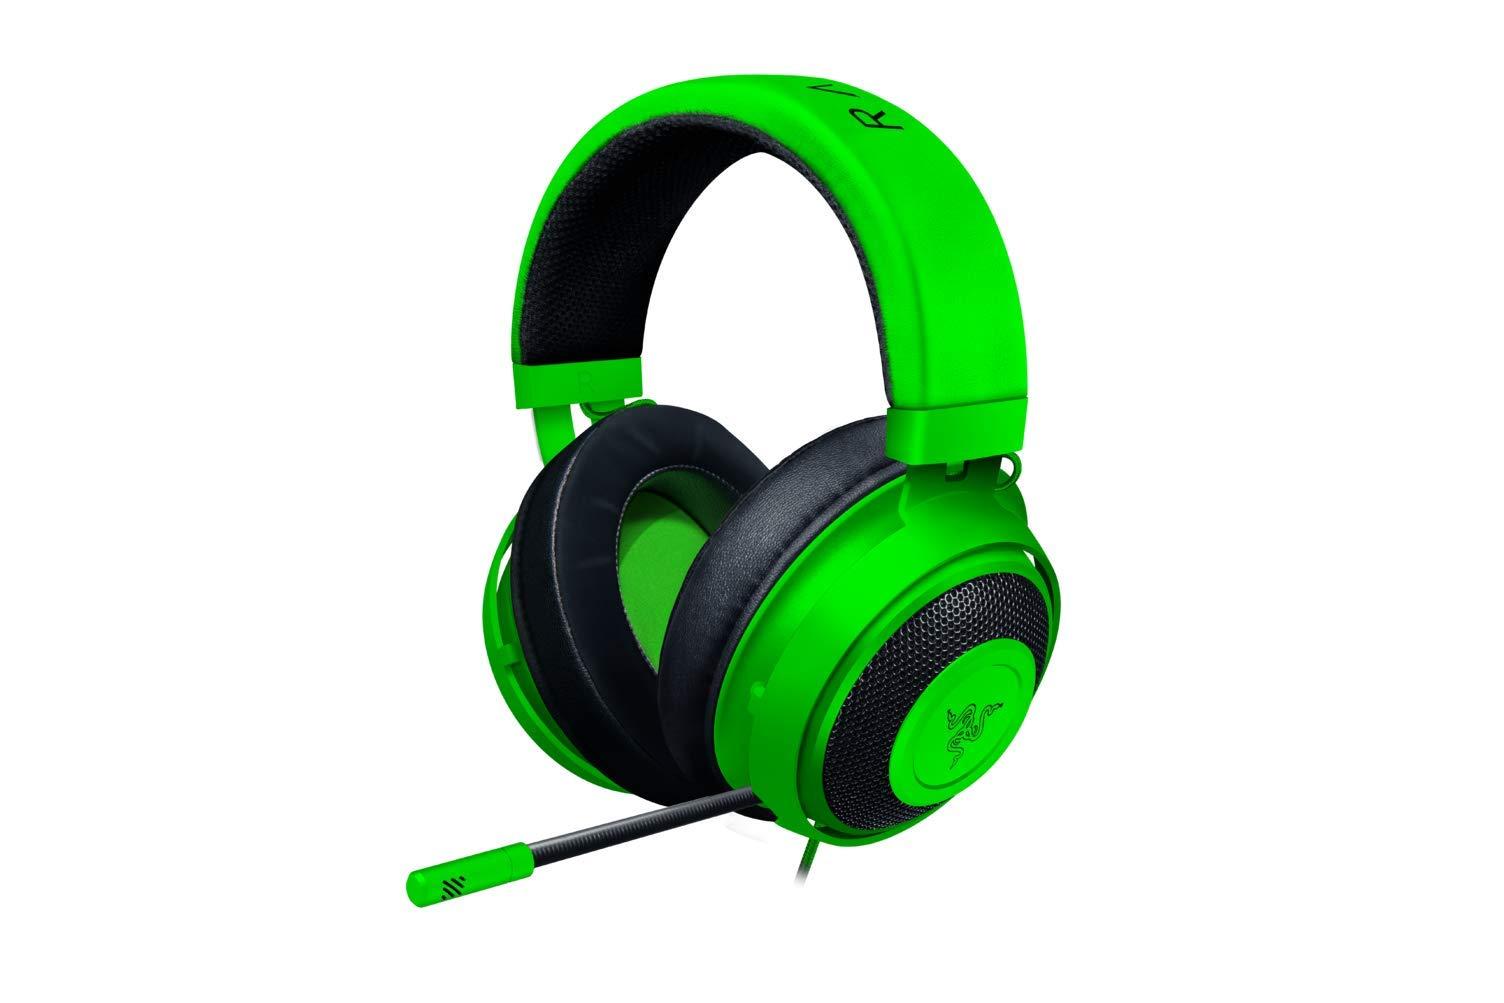 Razer Kraken Gaming Headset 2019: Lightweight Aluminum Frame - Retractable Noise Cancelling Mic - for PC, Xbox, PS4, Nintendo Switch - Green